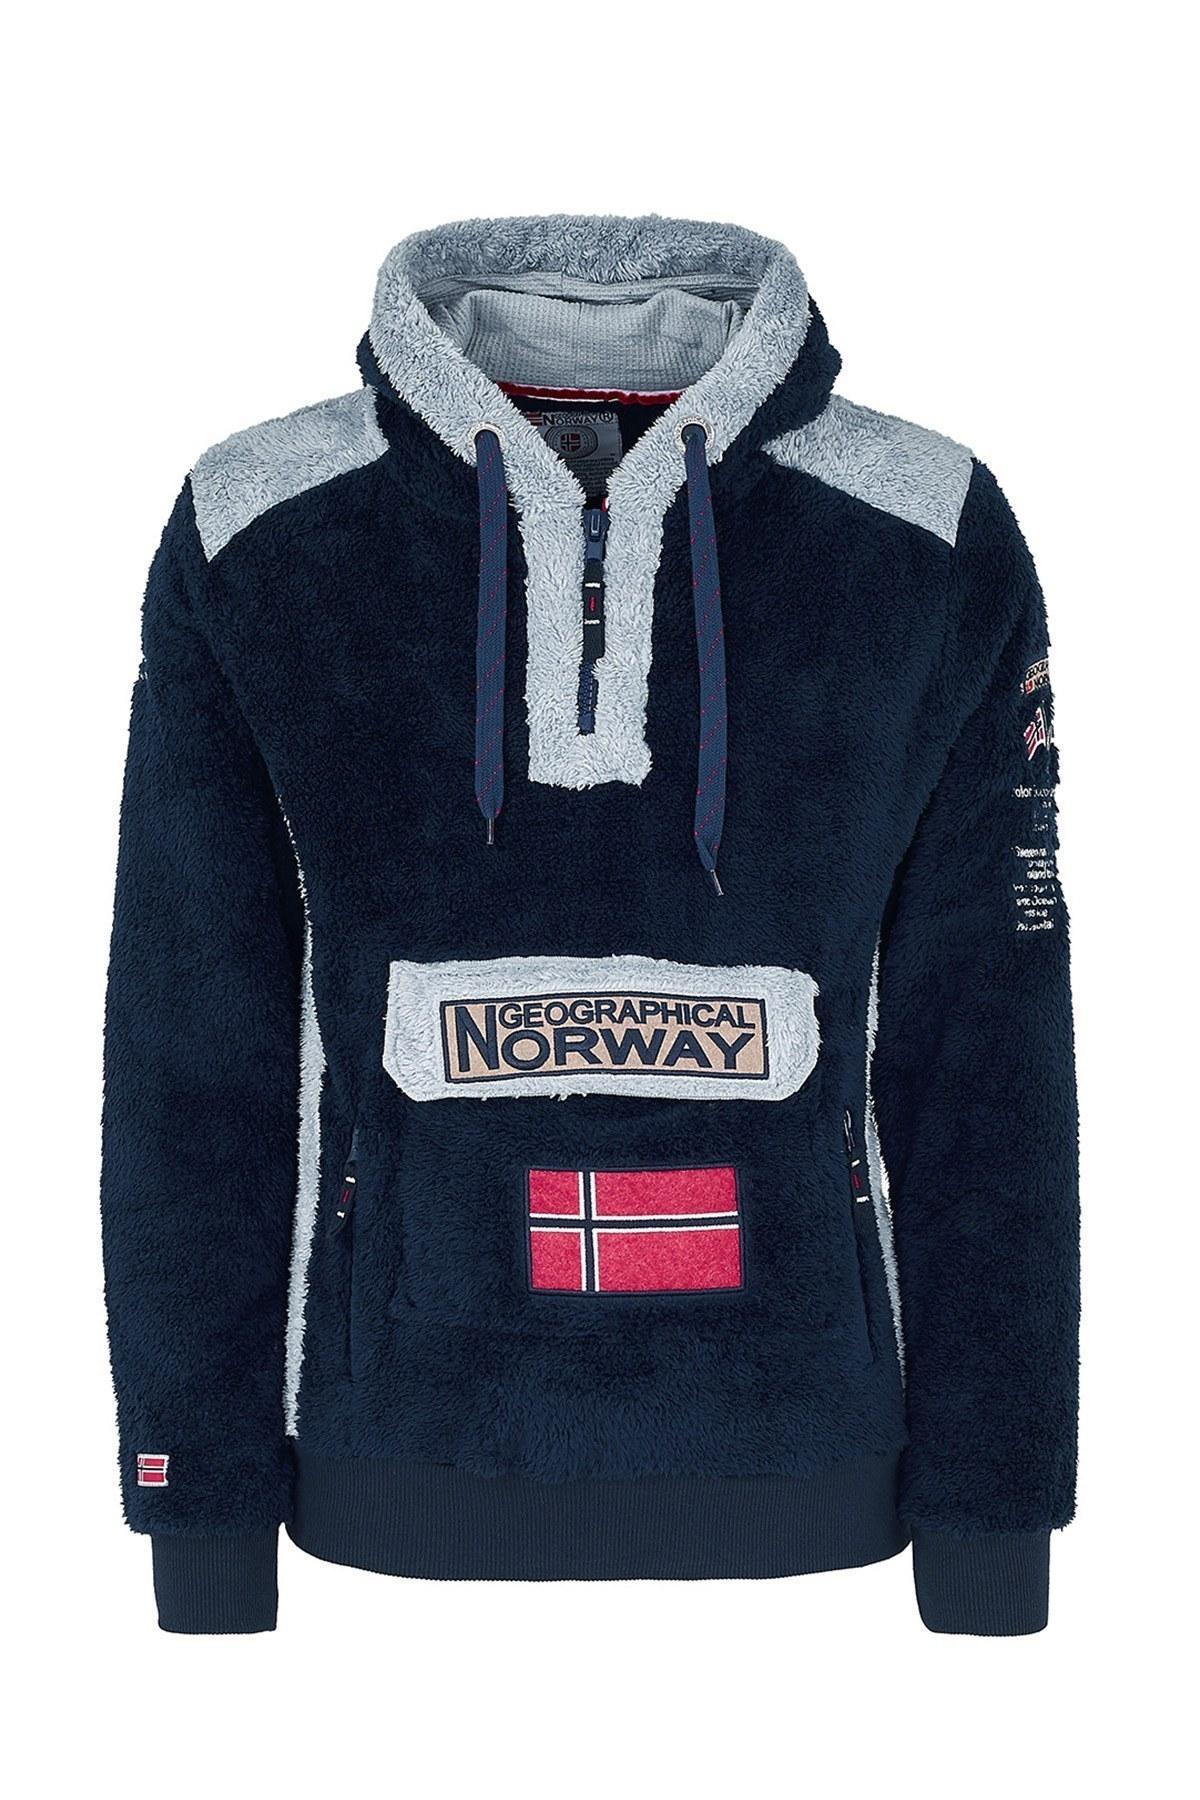 Norway Geographical Kapüşonlu Outdoor Polar Erkek Sweat GYMCLASS E LACİVERT